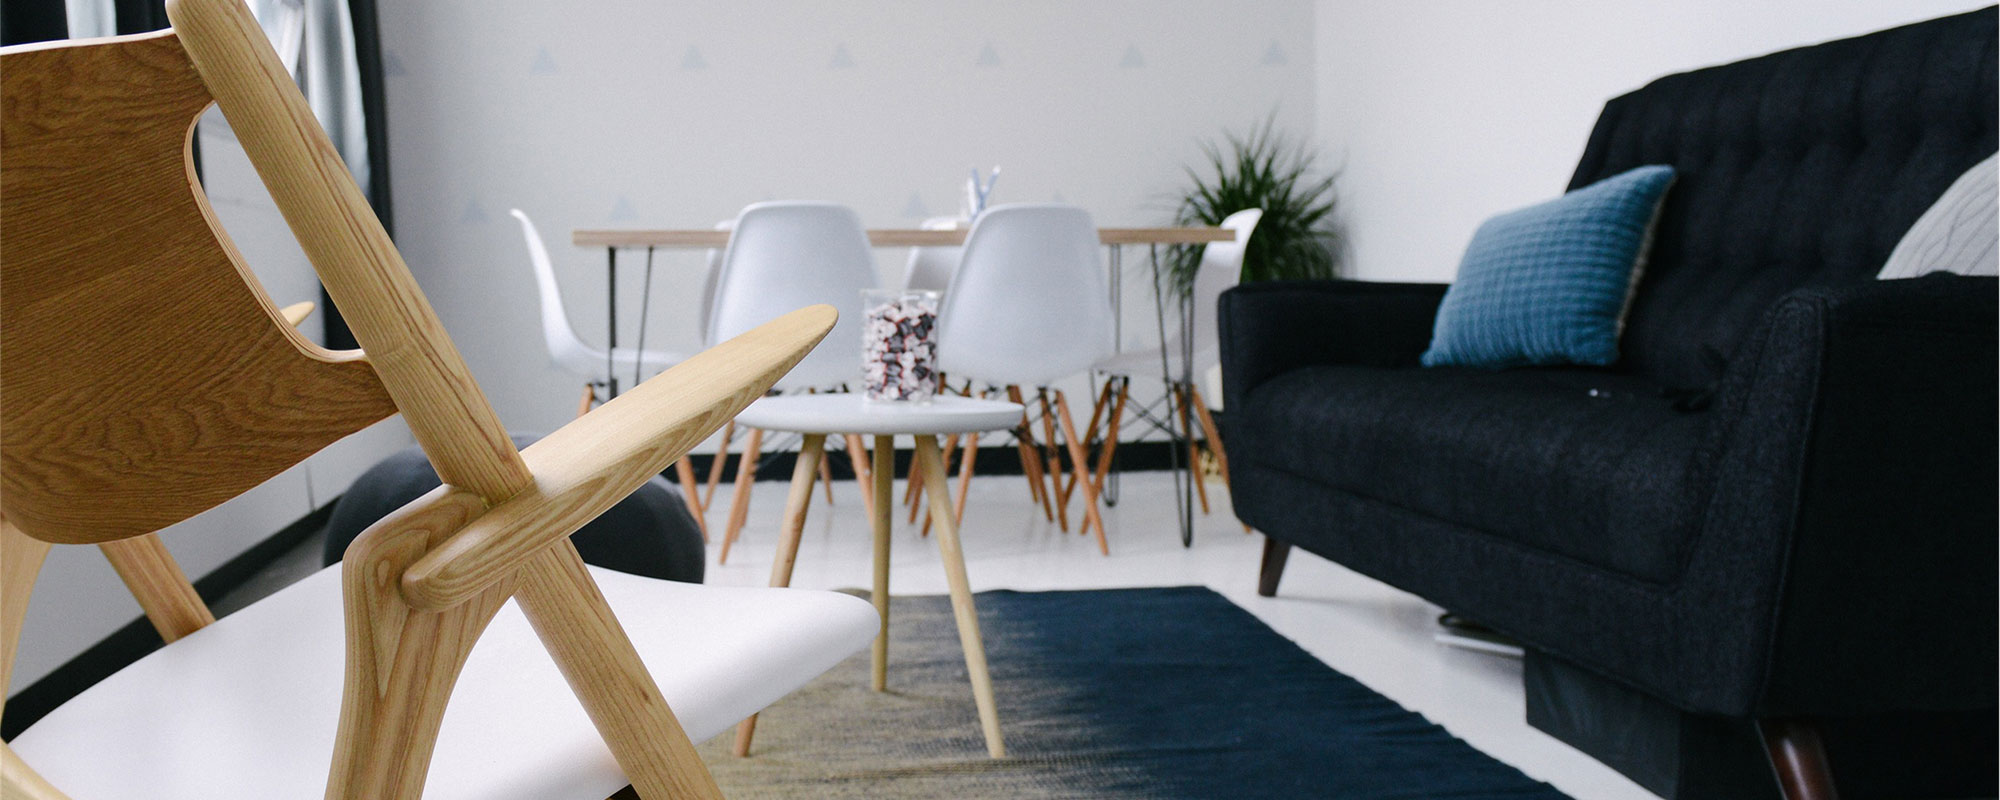 furniture-pos-mediasoftbd-banner